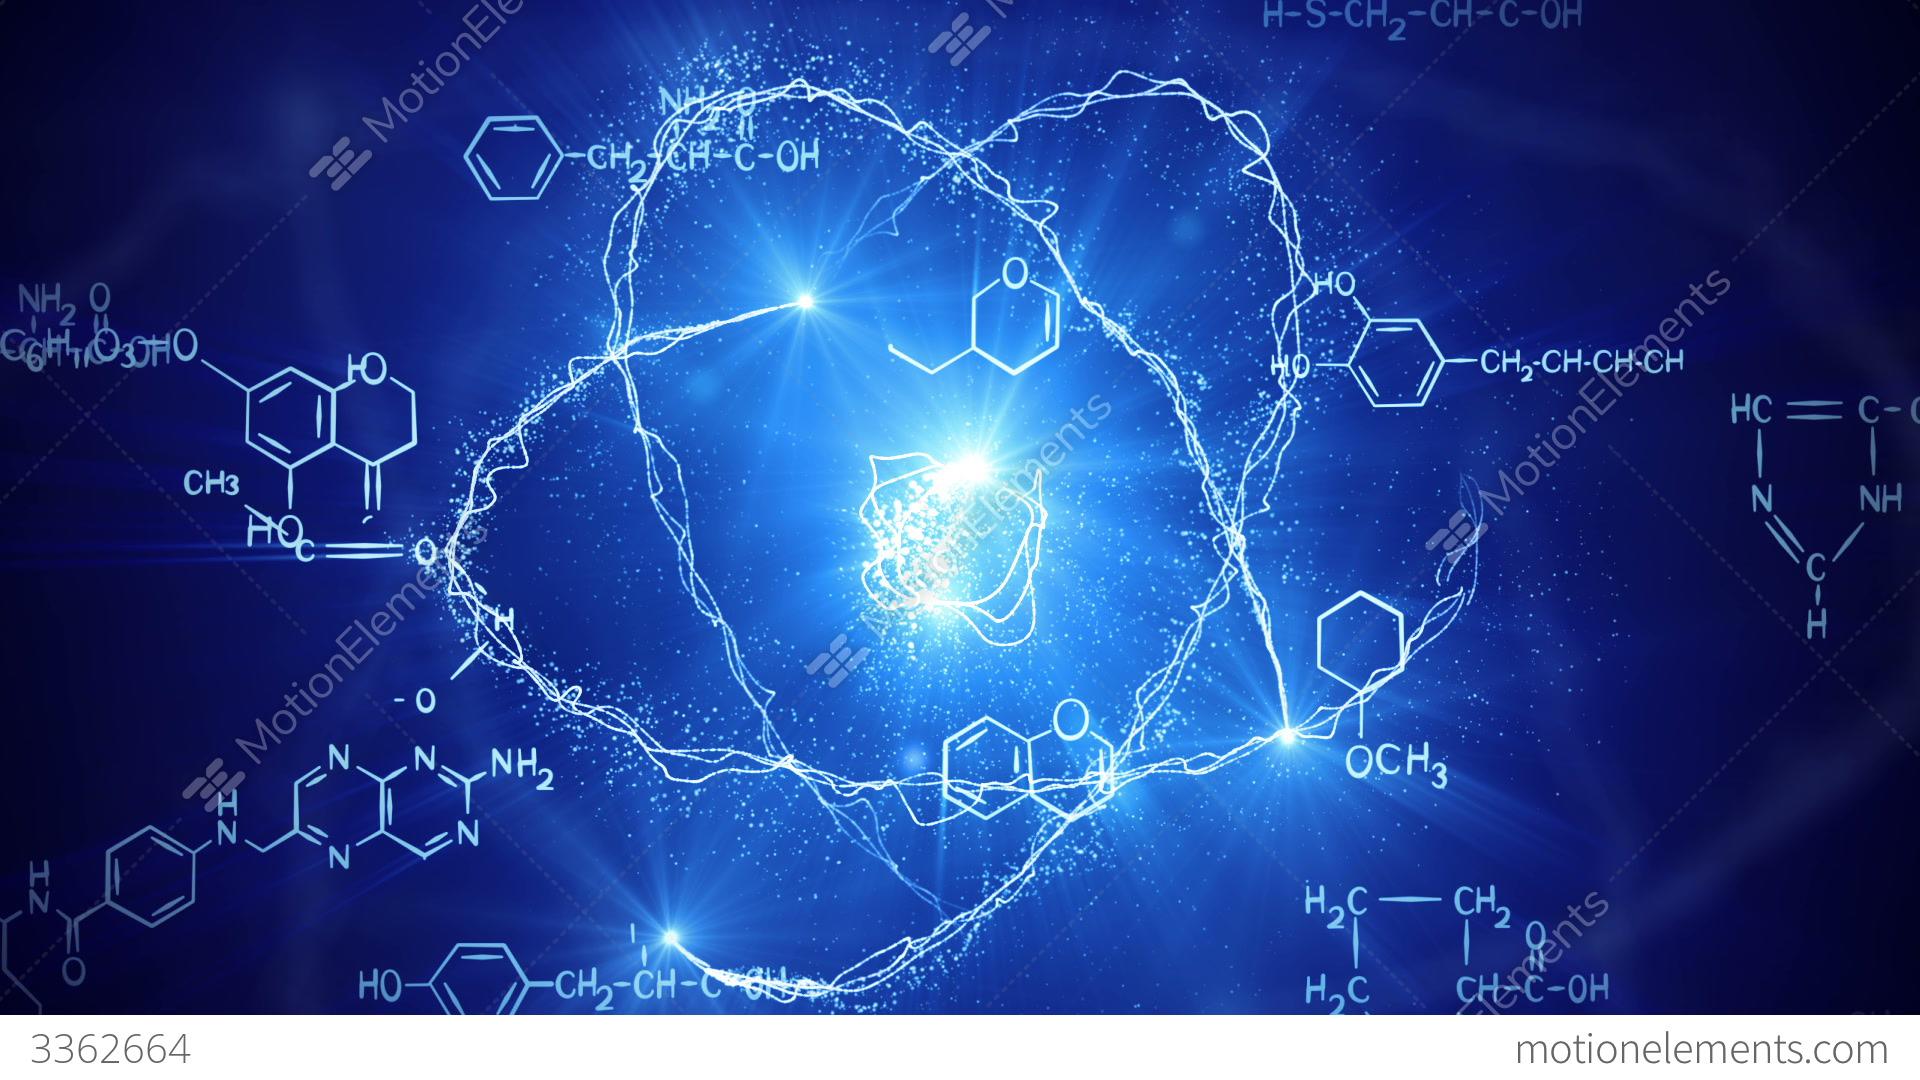 Shiny Atom Model And Chemistry Formulas Loopable Stock